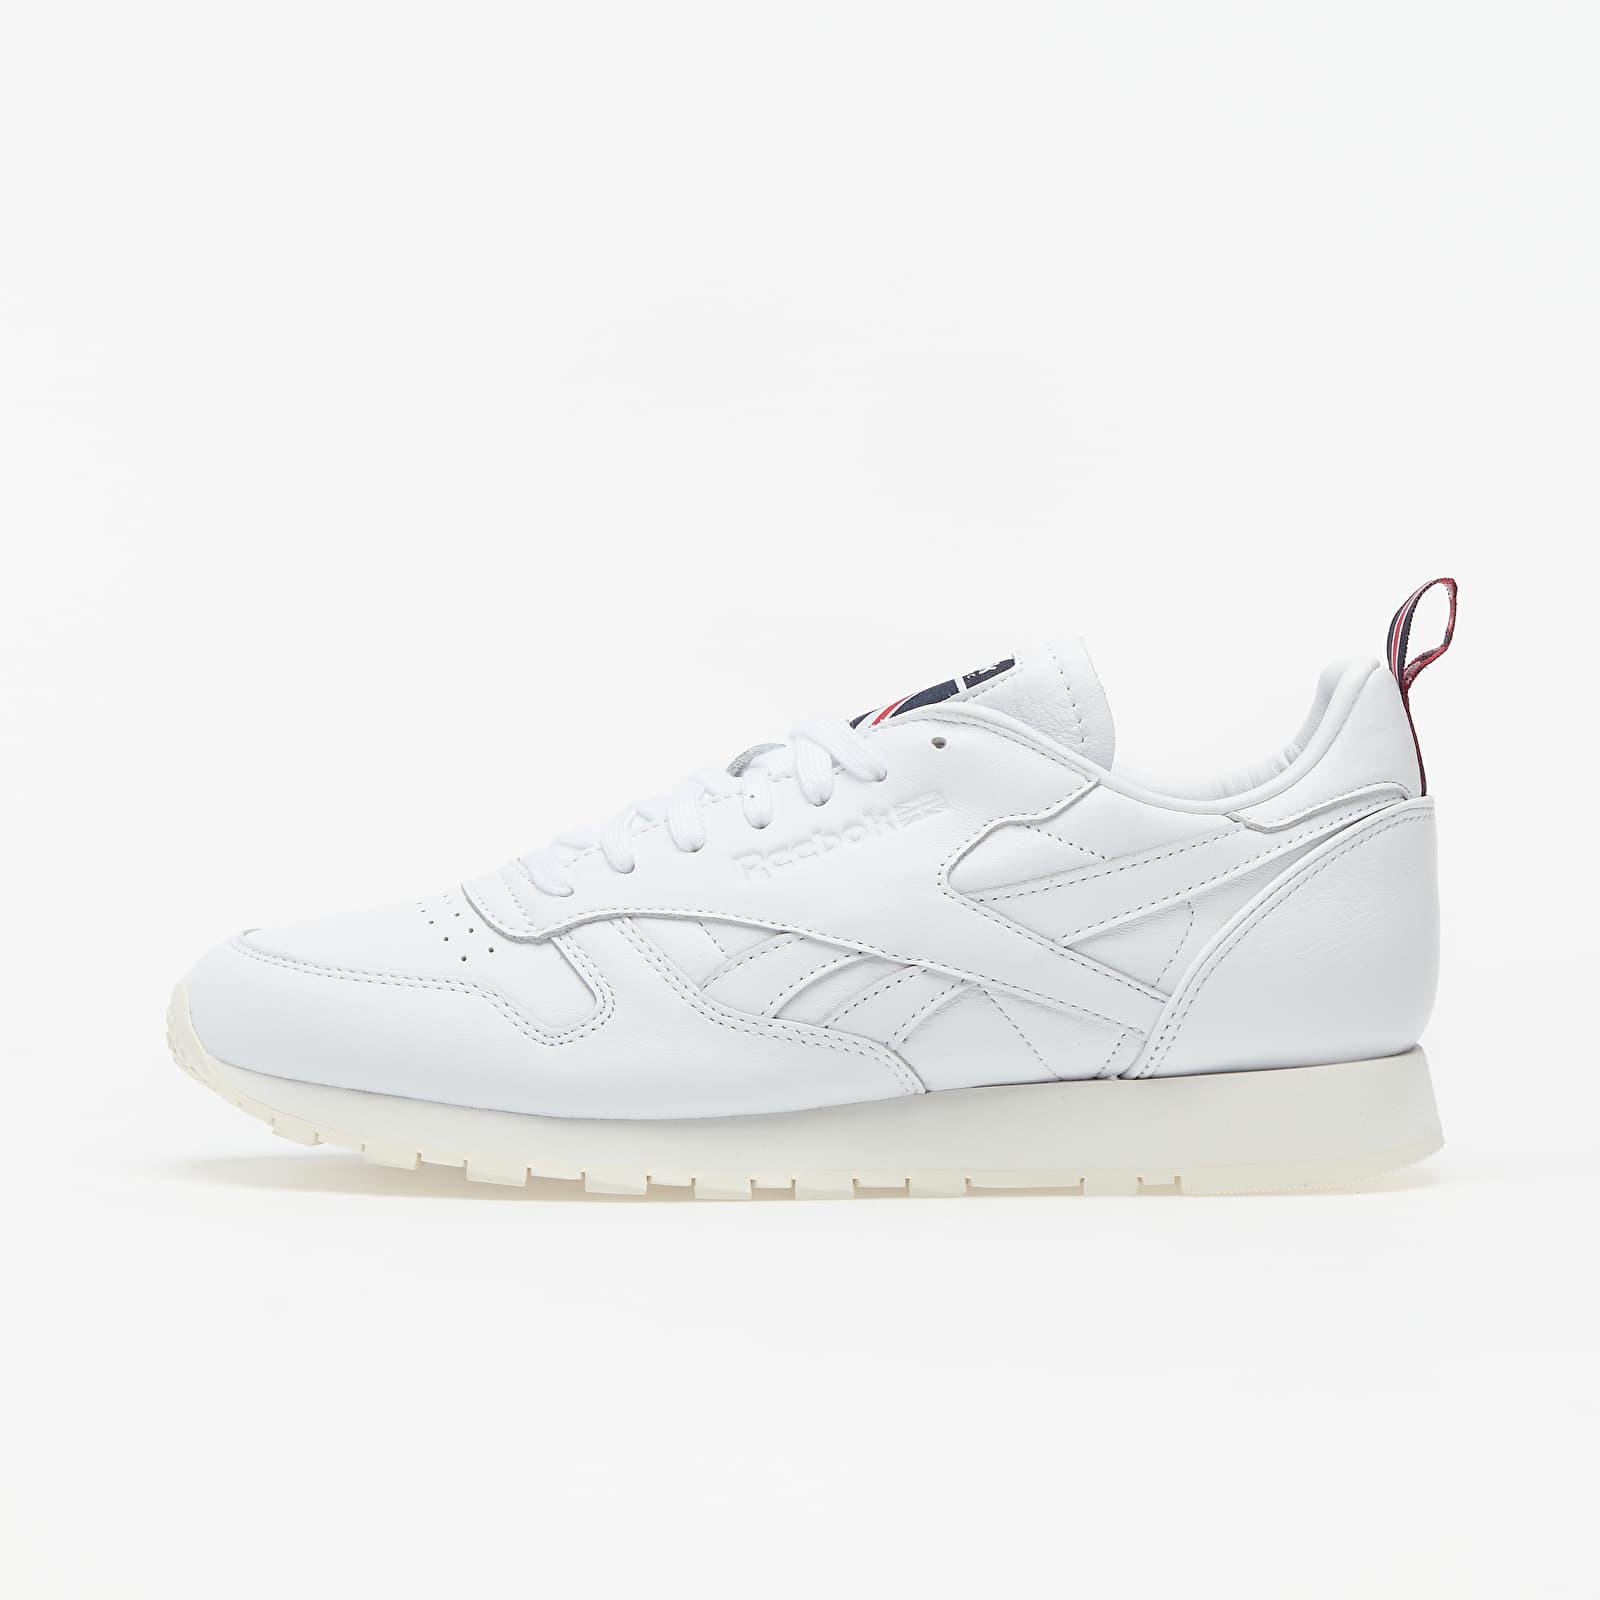 Reebok Classic Leather White/ Chalk/ Vector Navy EUR 44